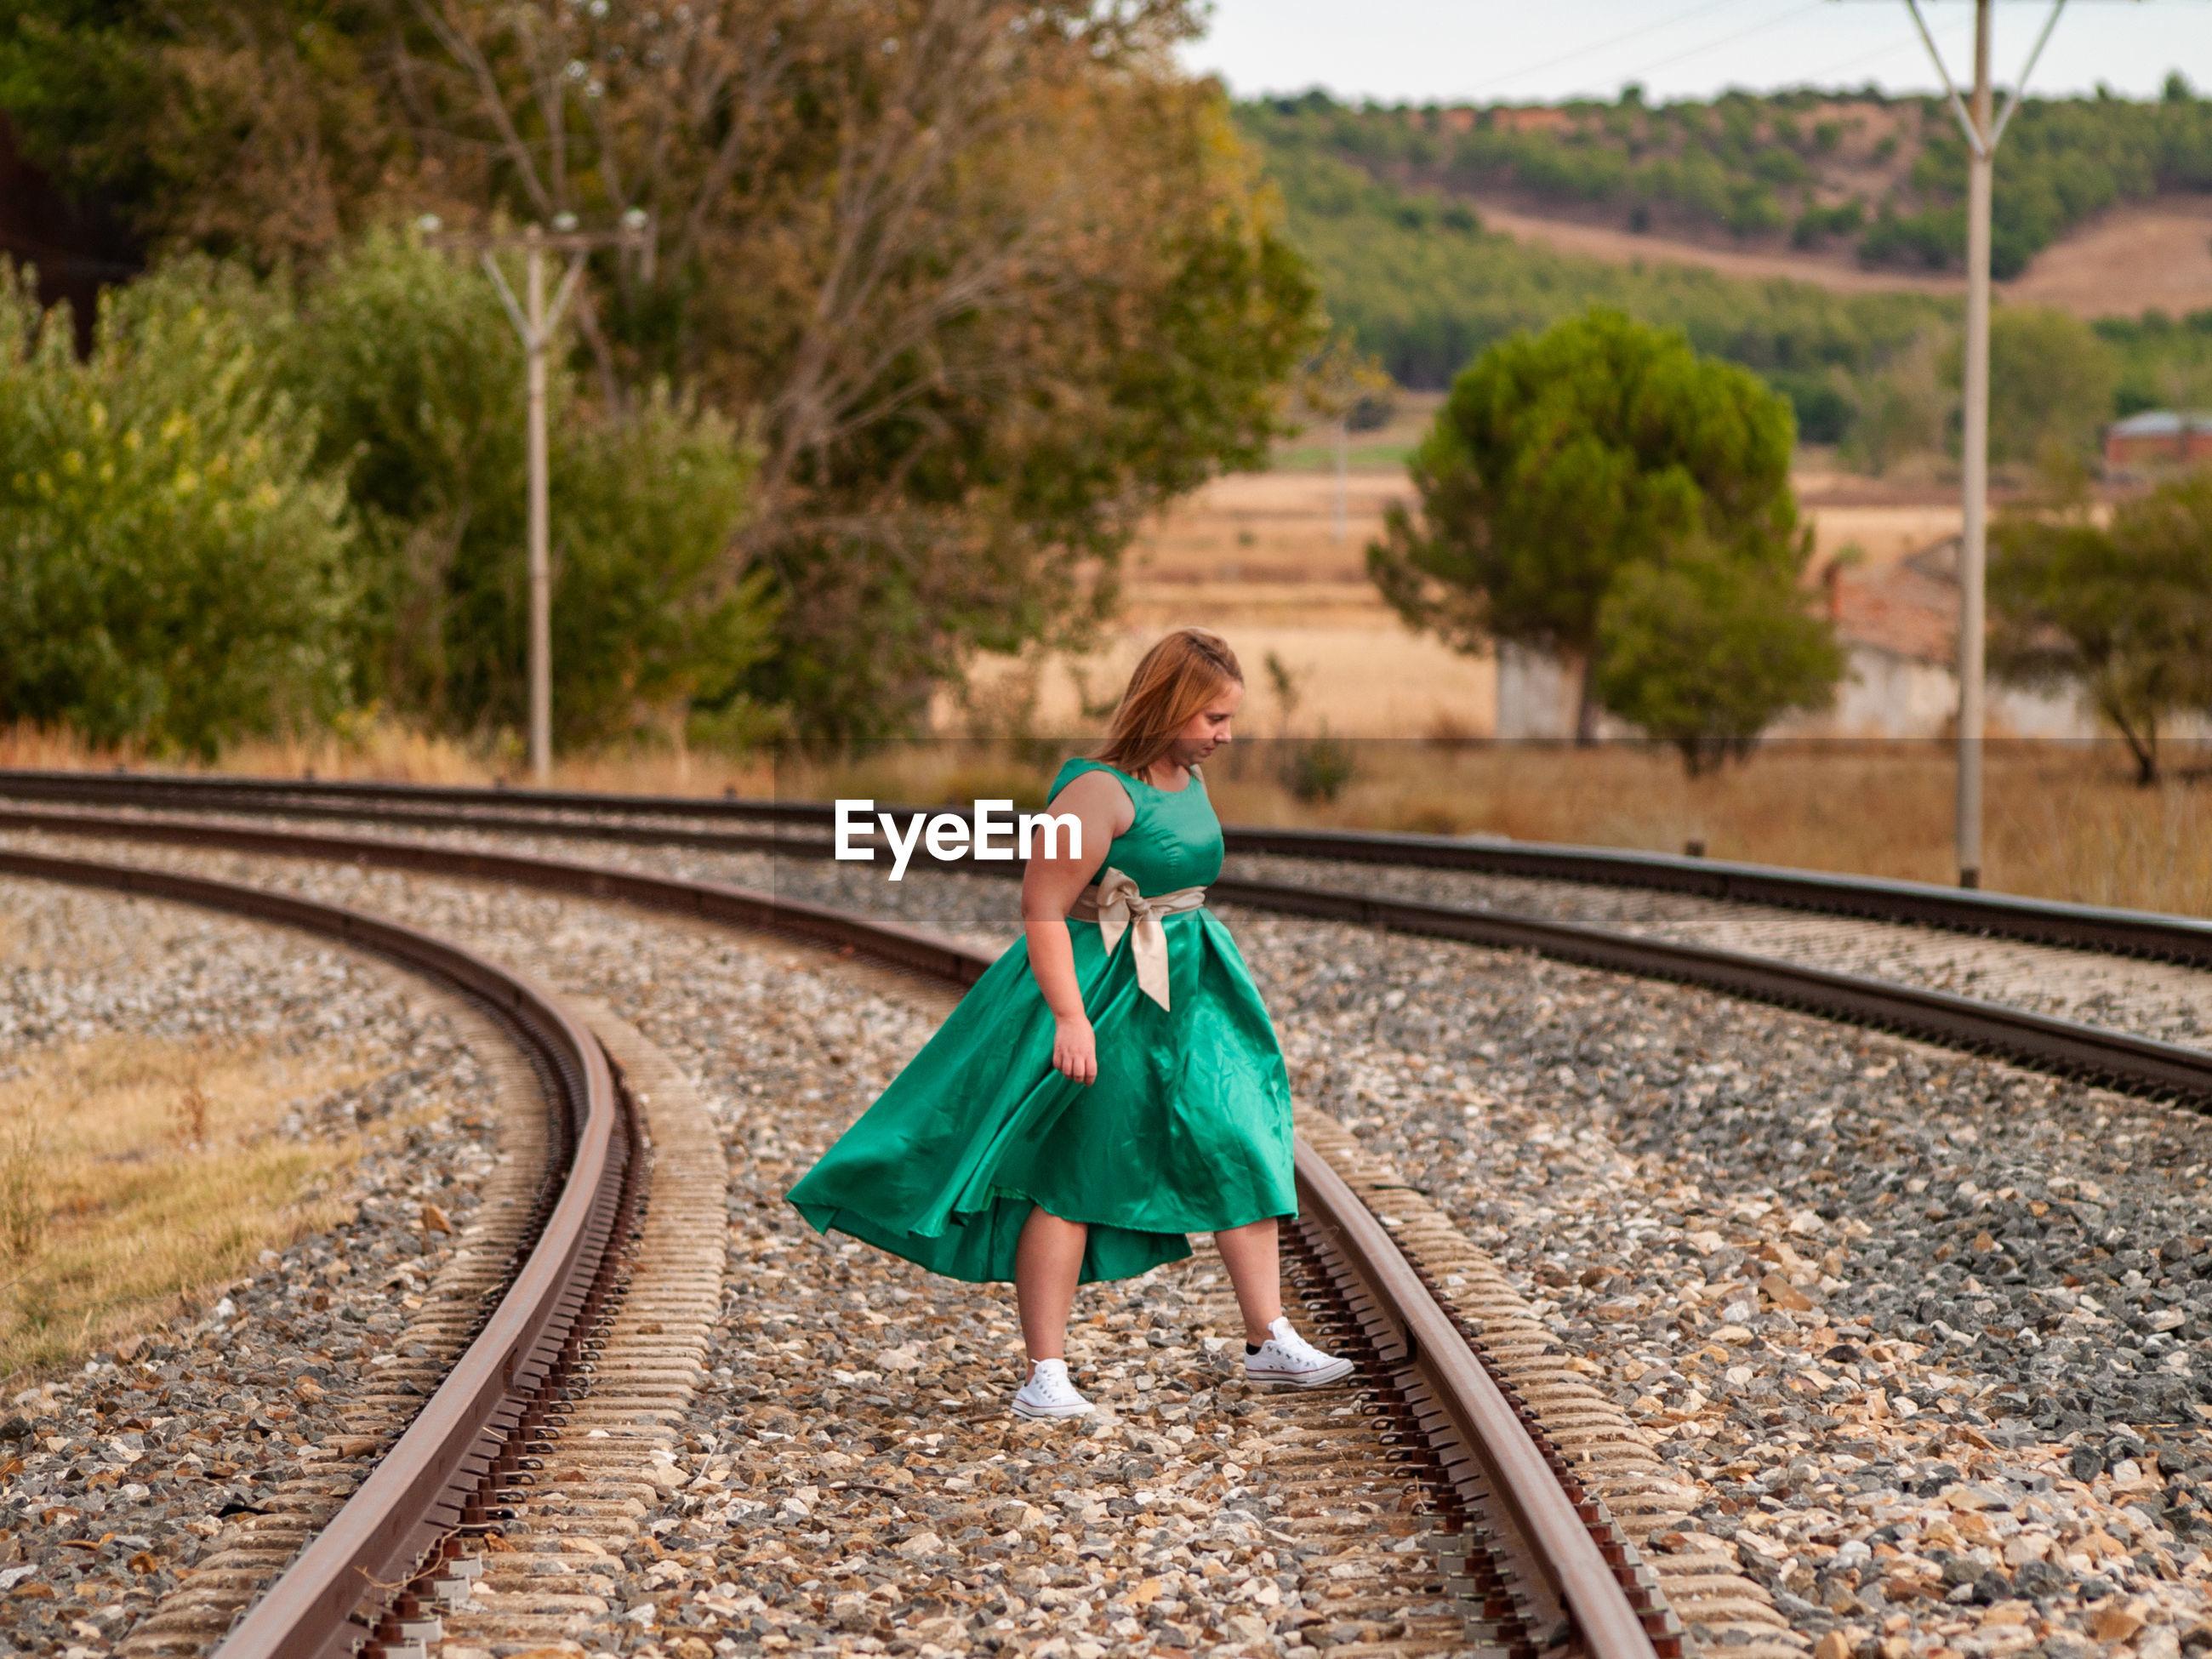 Woman standing on railroad tracks